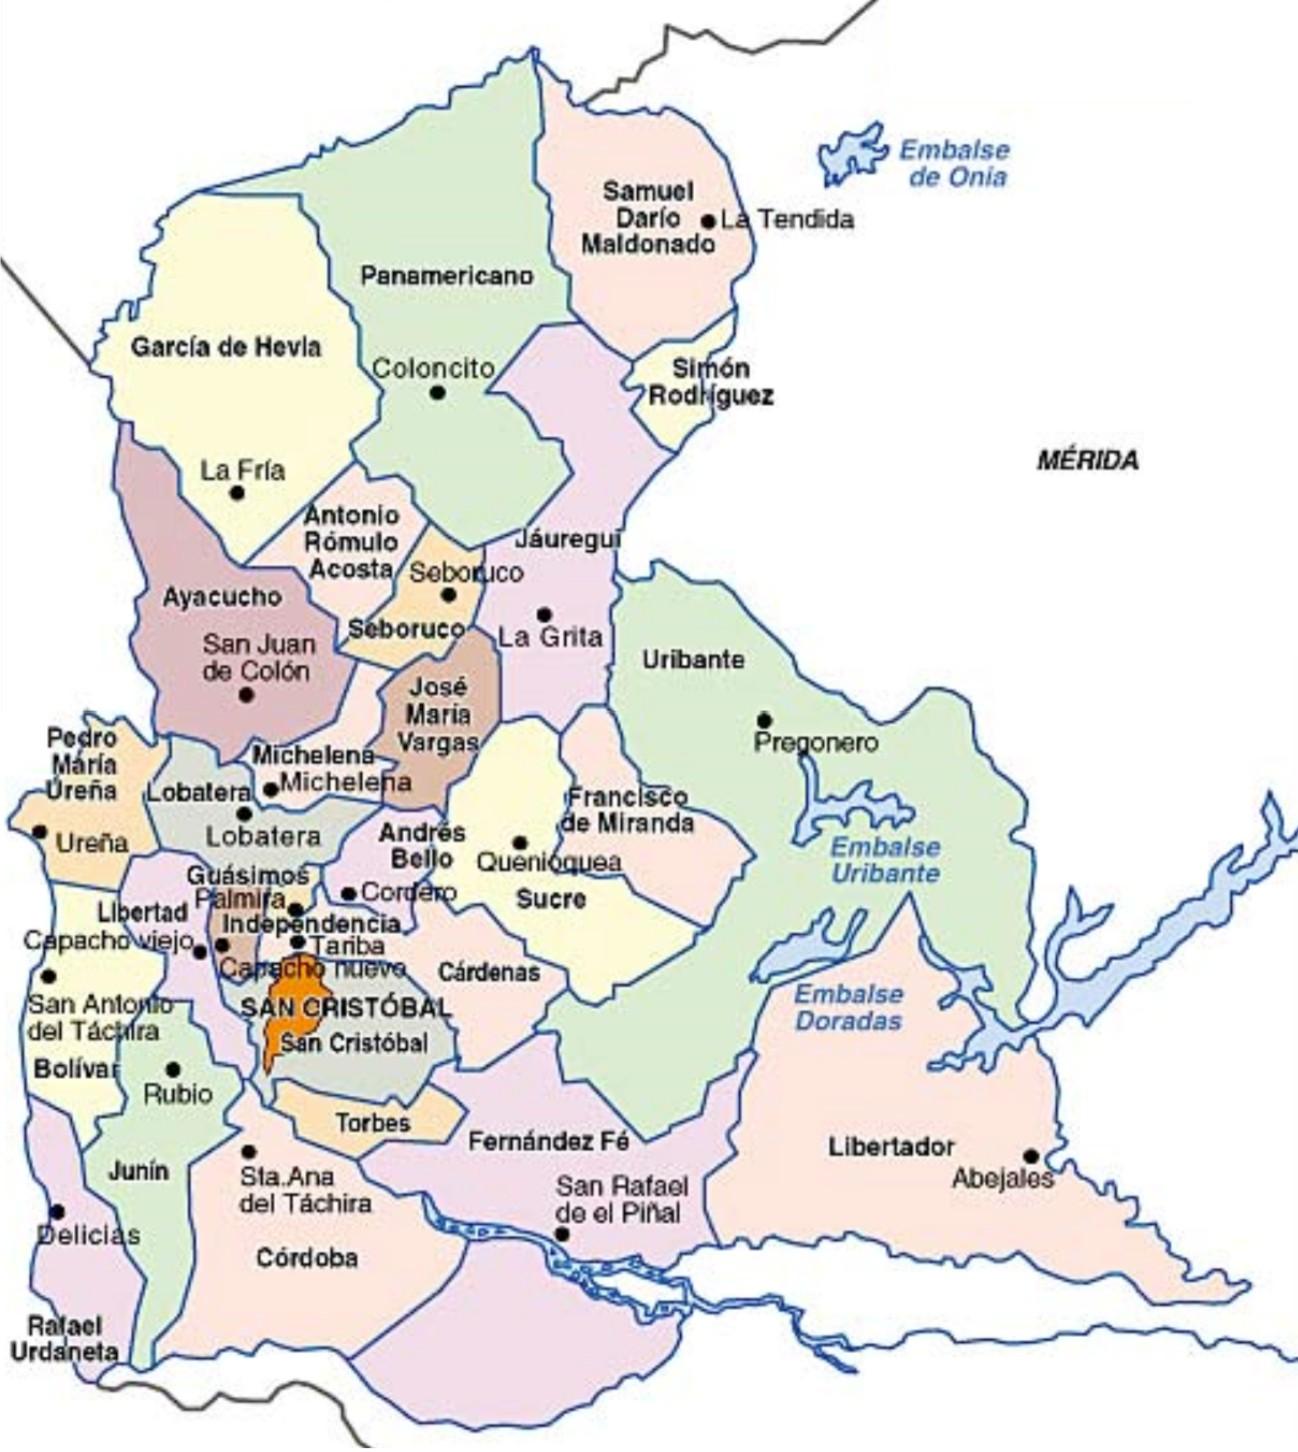 Mapa Del Estado Tachira Venezuela